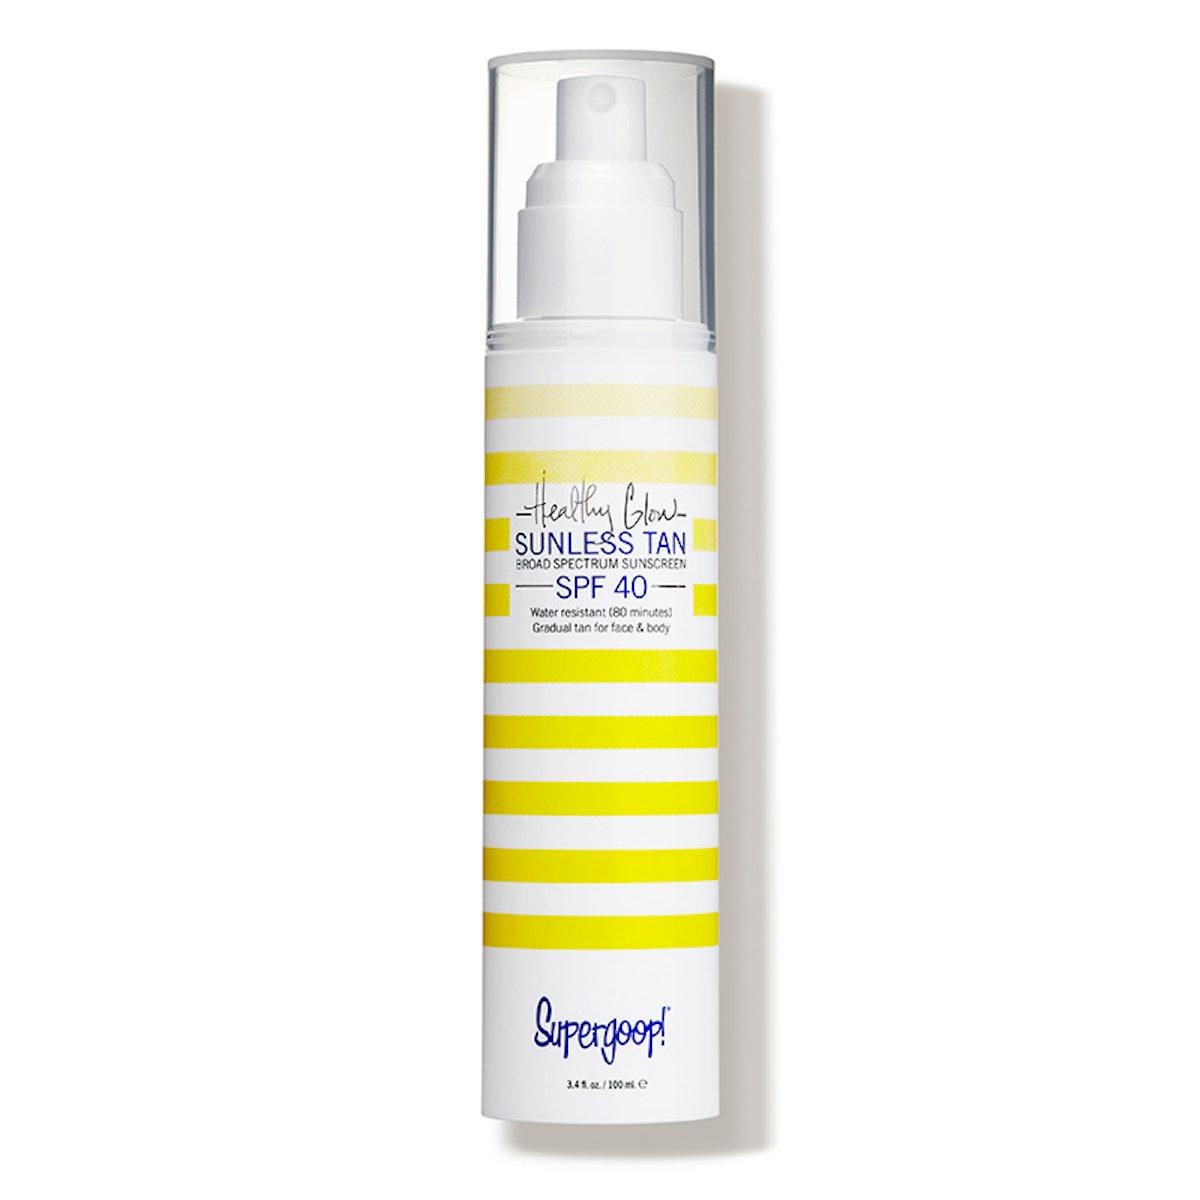 Healthy Glow Sunless Tan